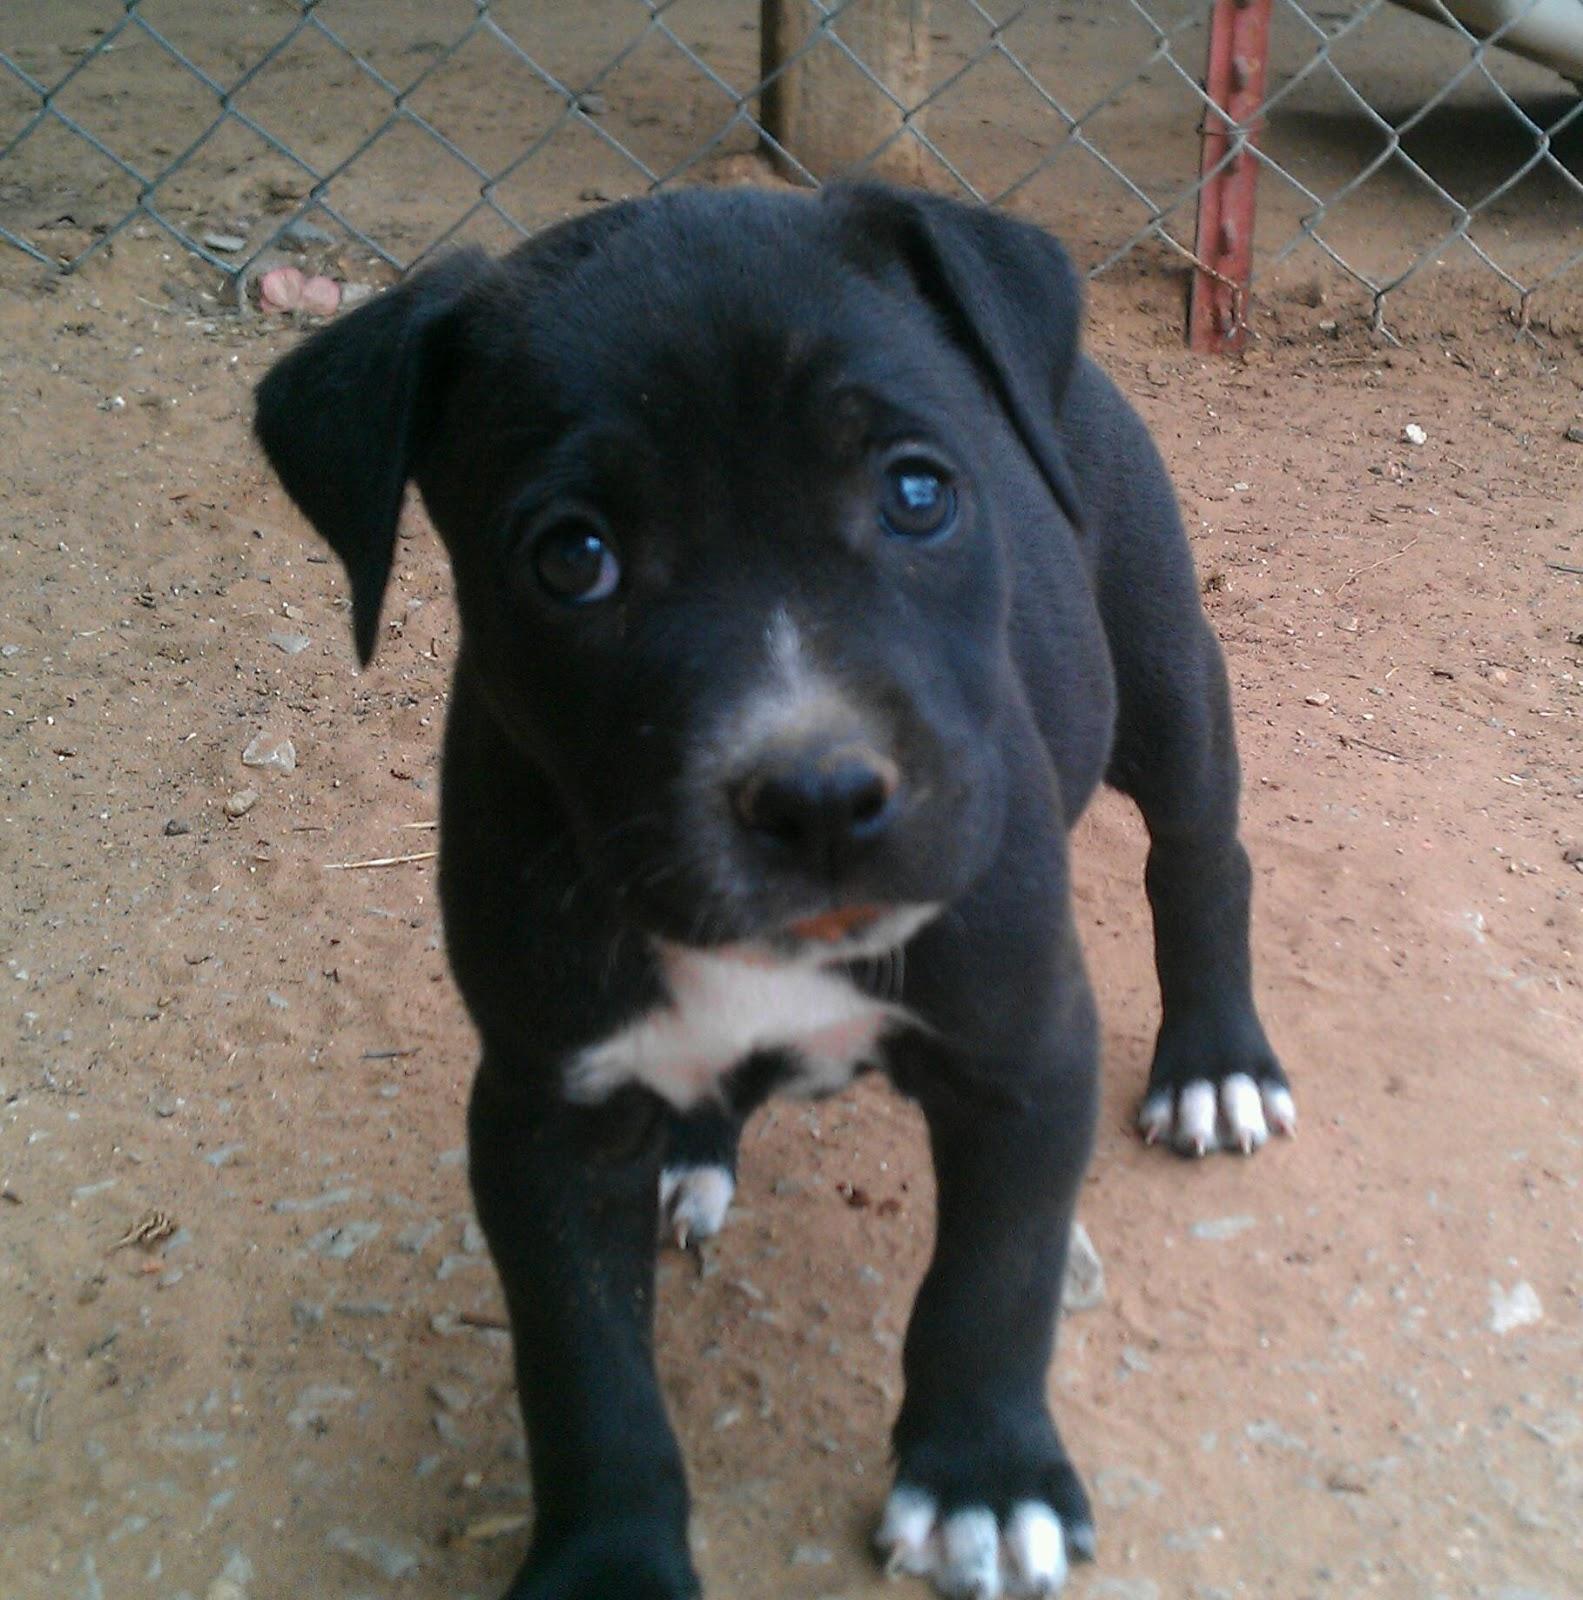 Posted by soma sekhar at 5 34 AMBlack And White Pitbull Dogs